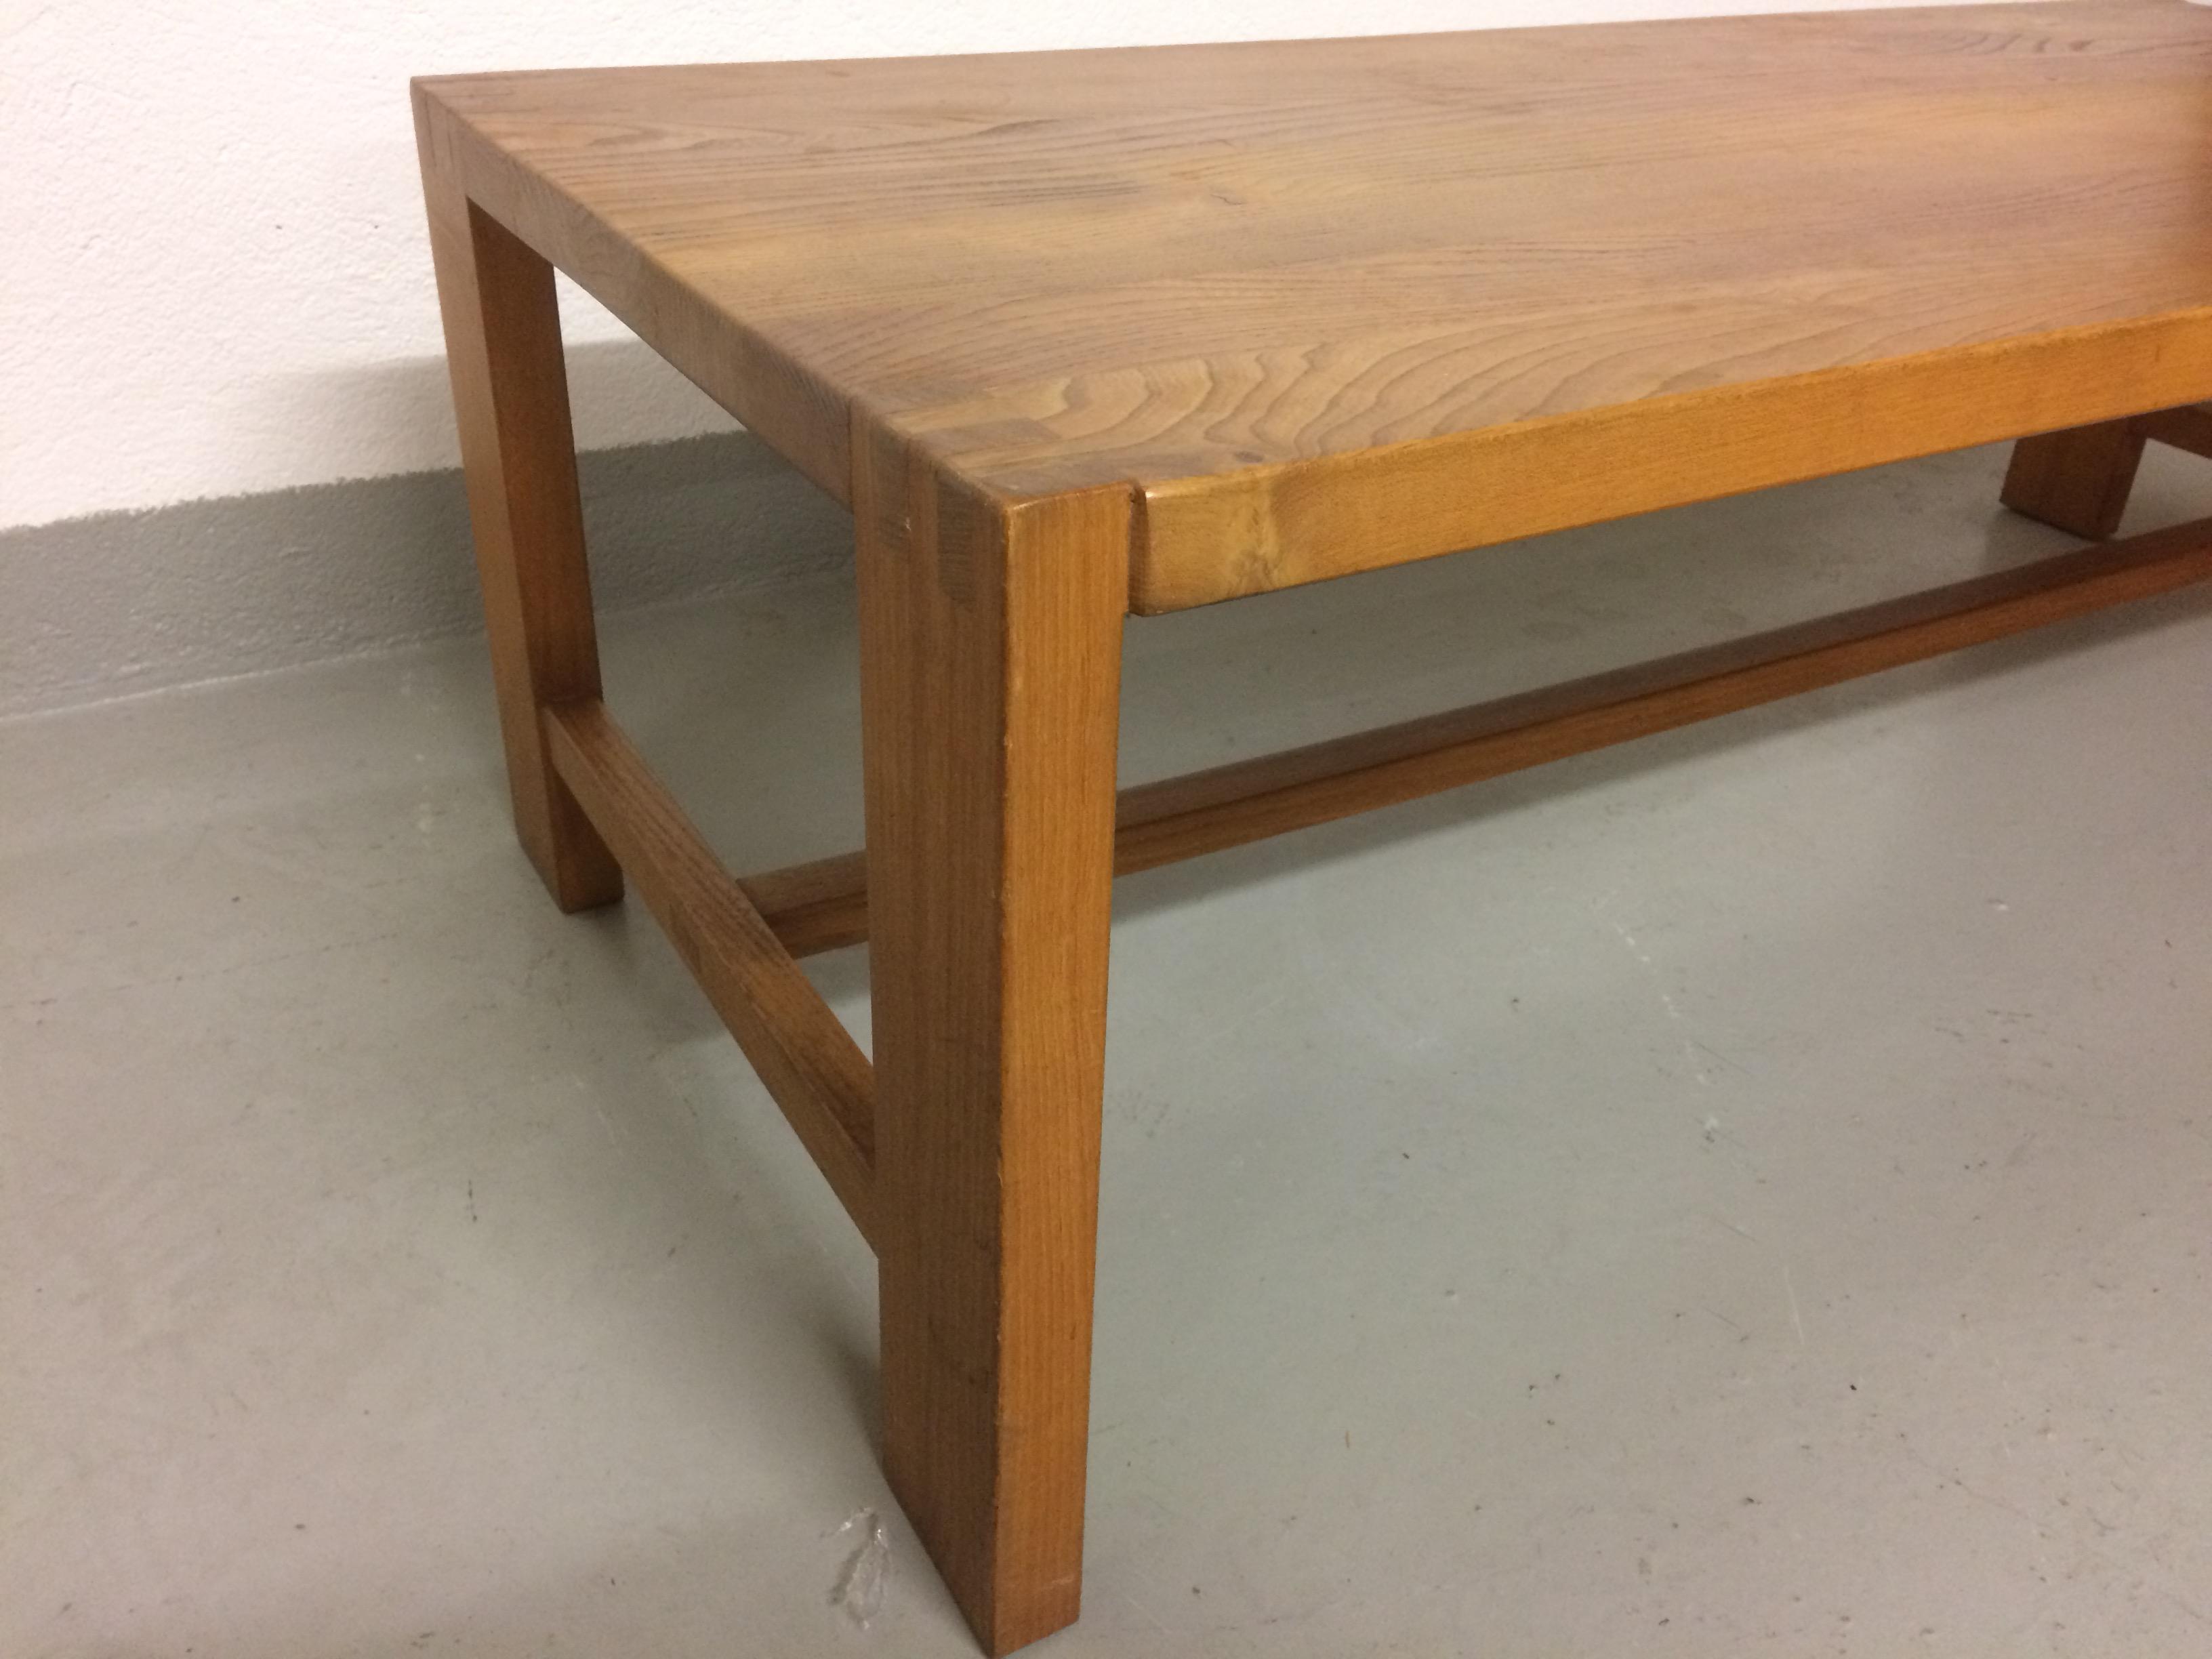 Pierre Chapo Table Basse Orme Massif T06 Les Illumin S